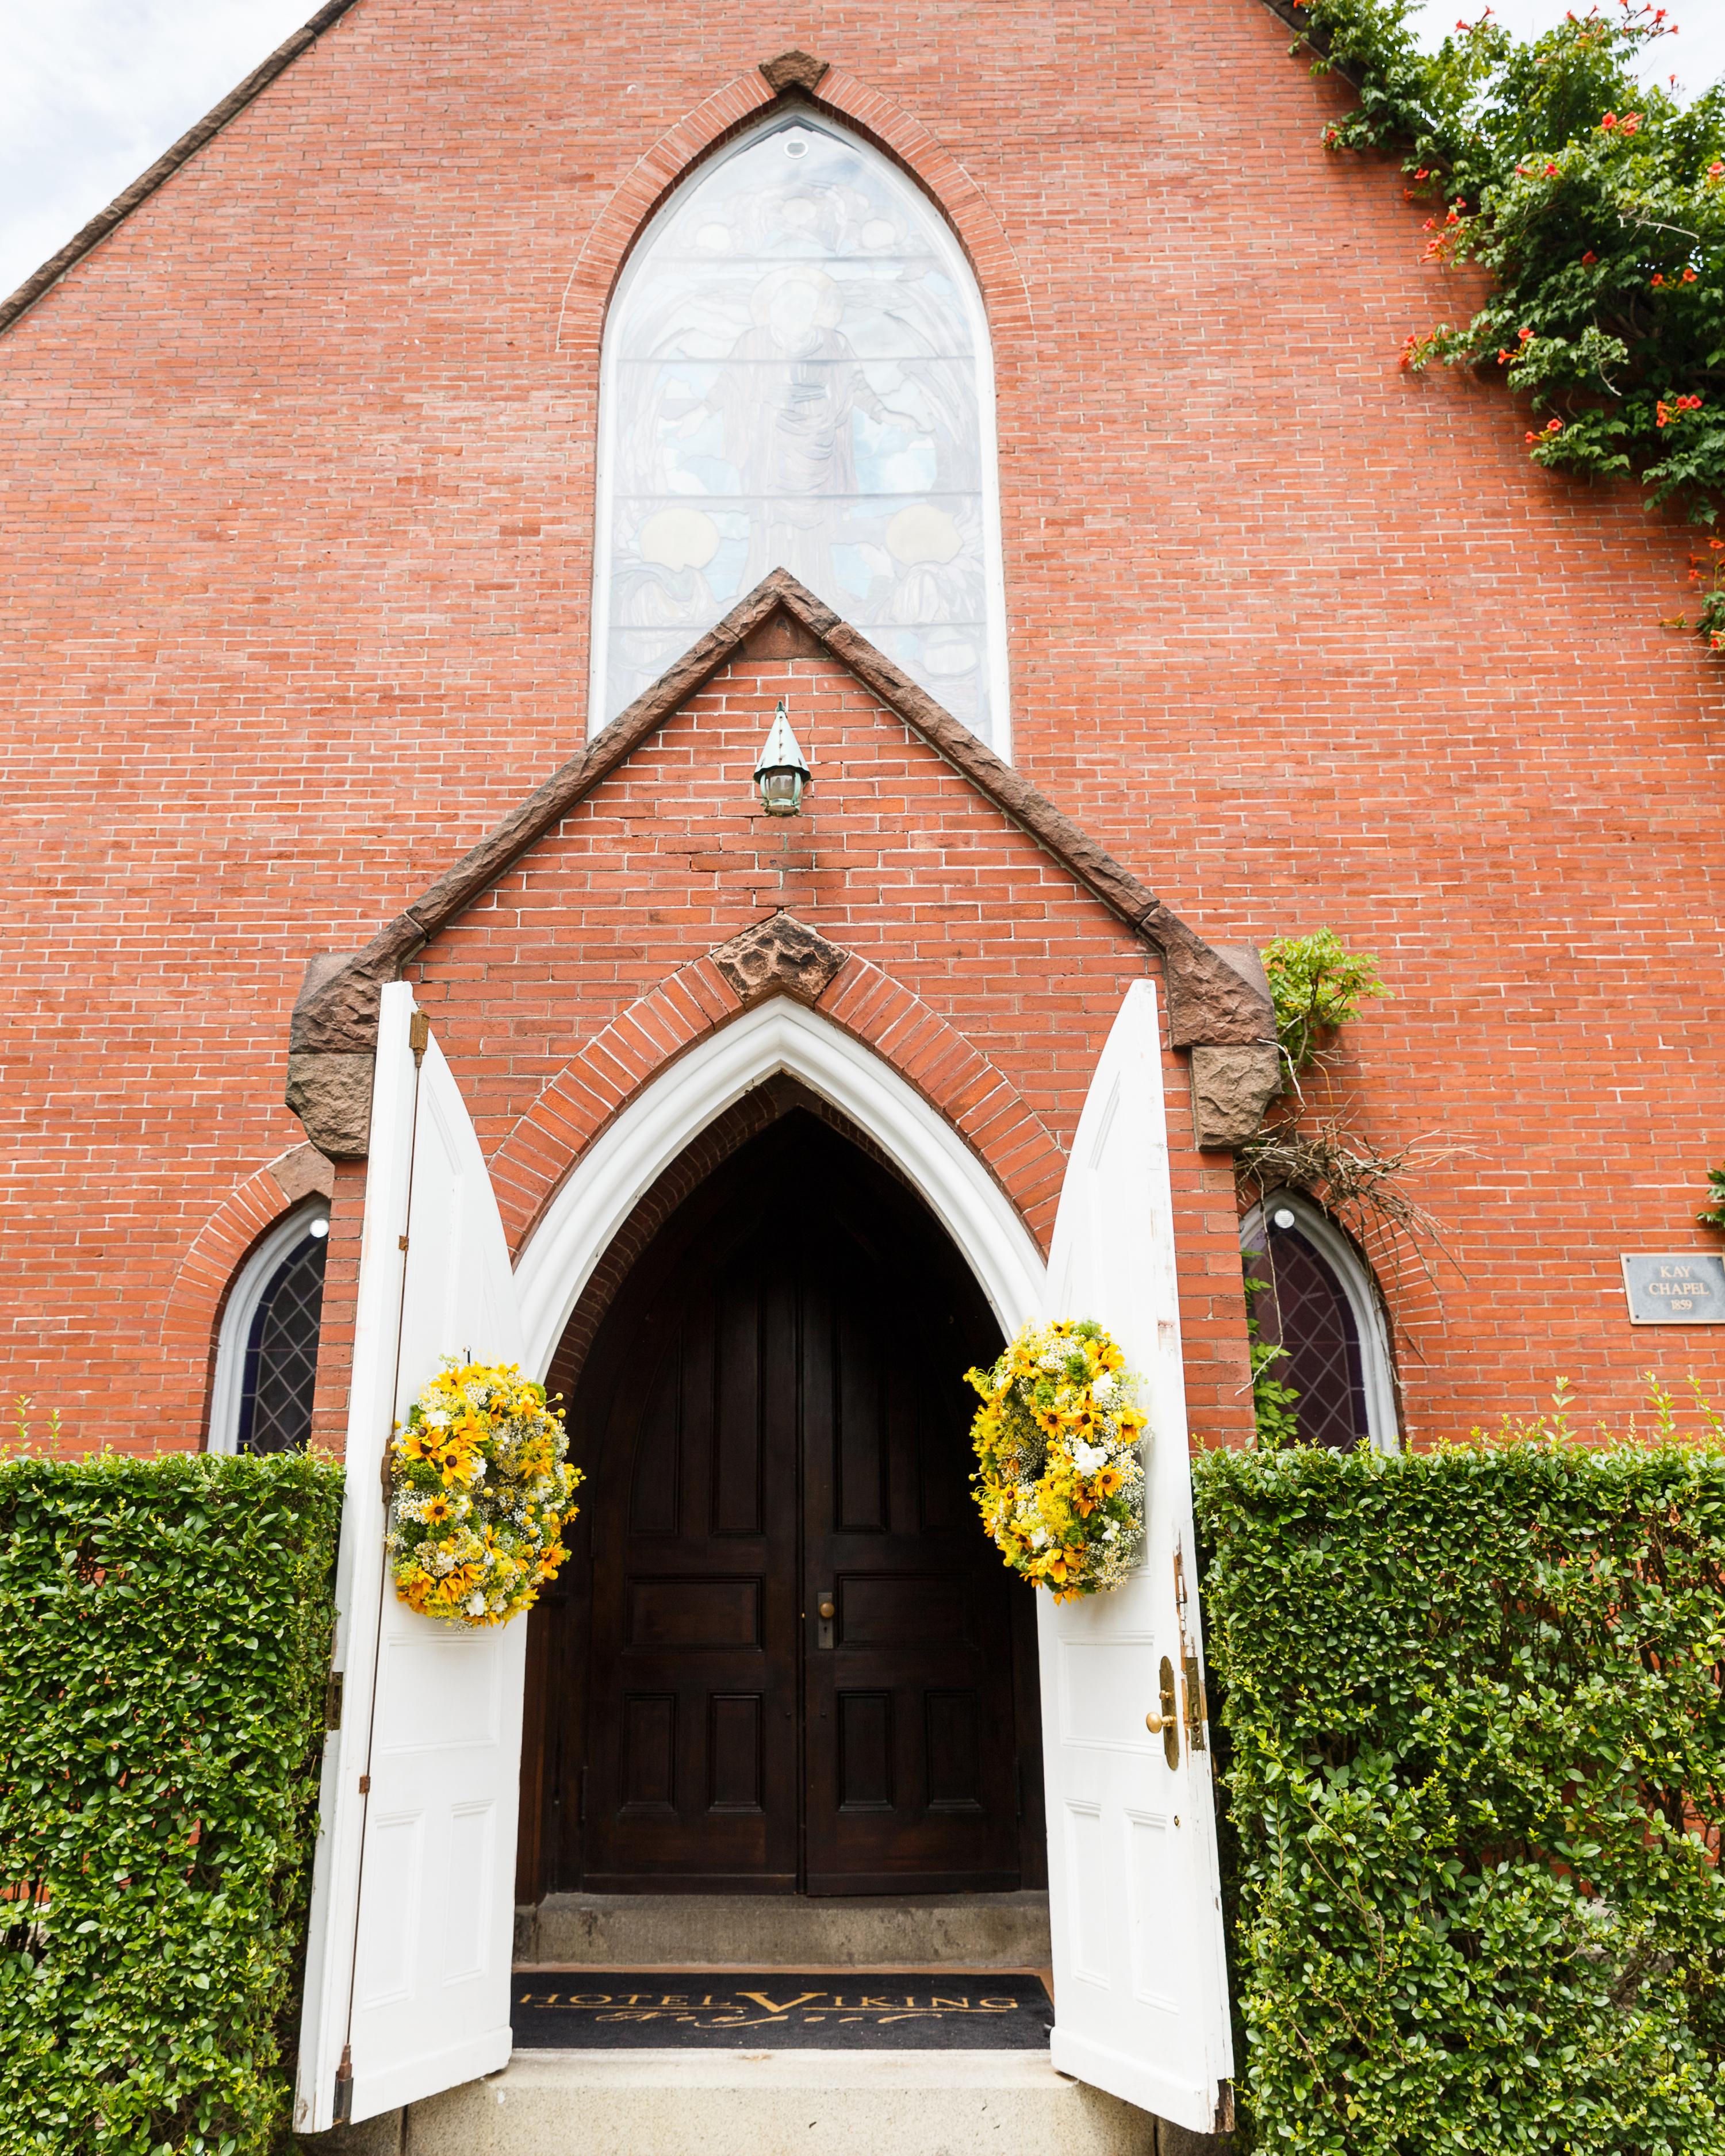 kristel-austin-wedding-church-0590-s11860-0415.jpg